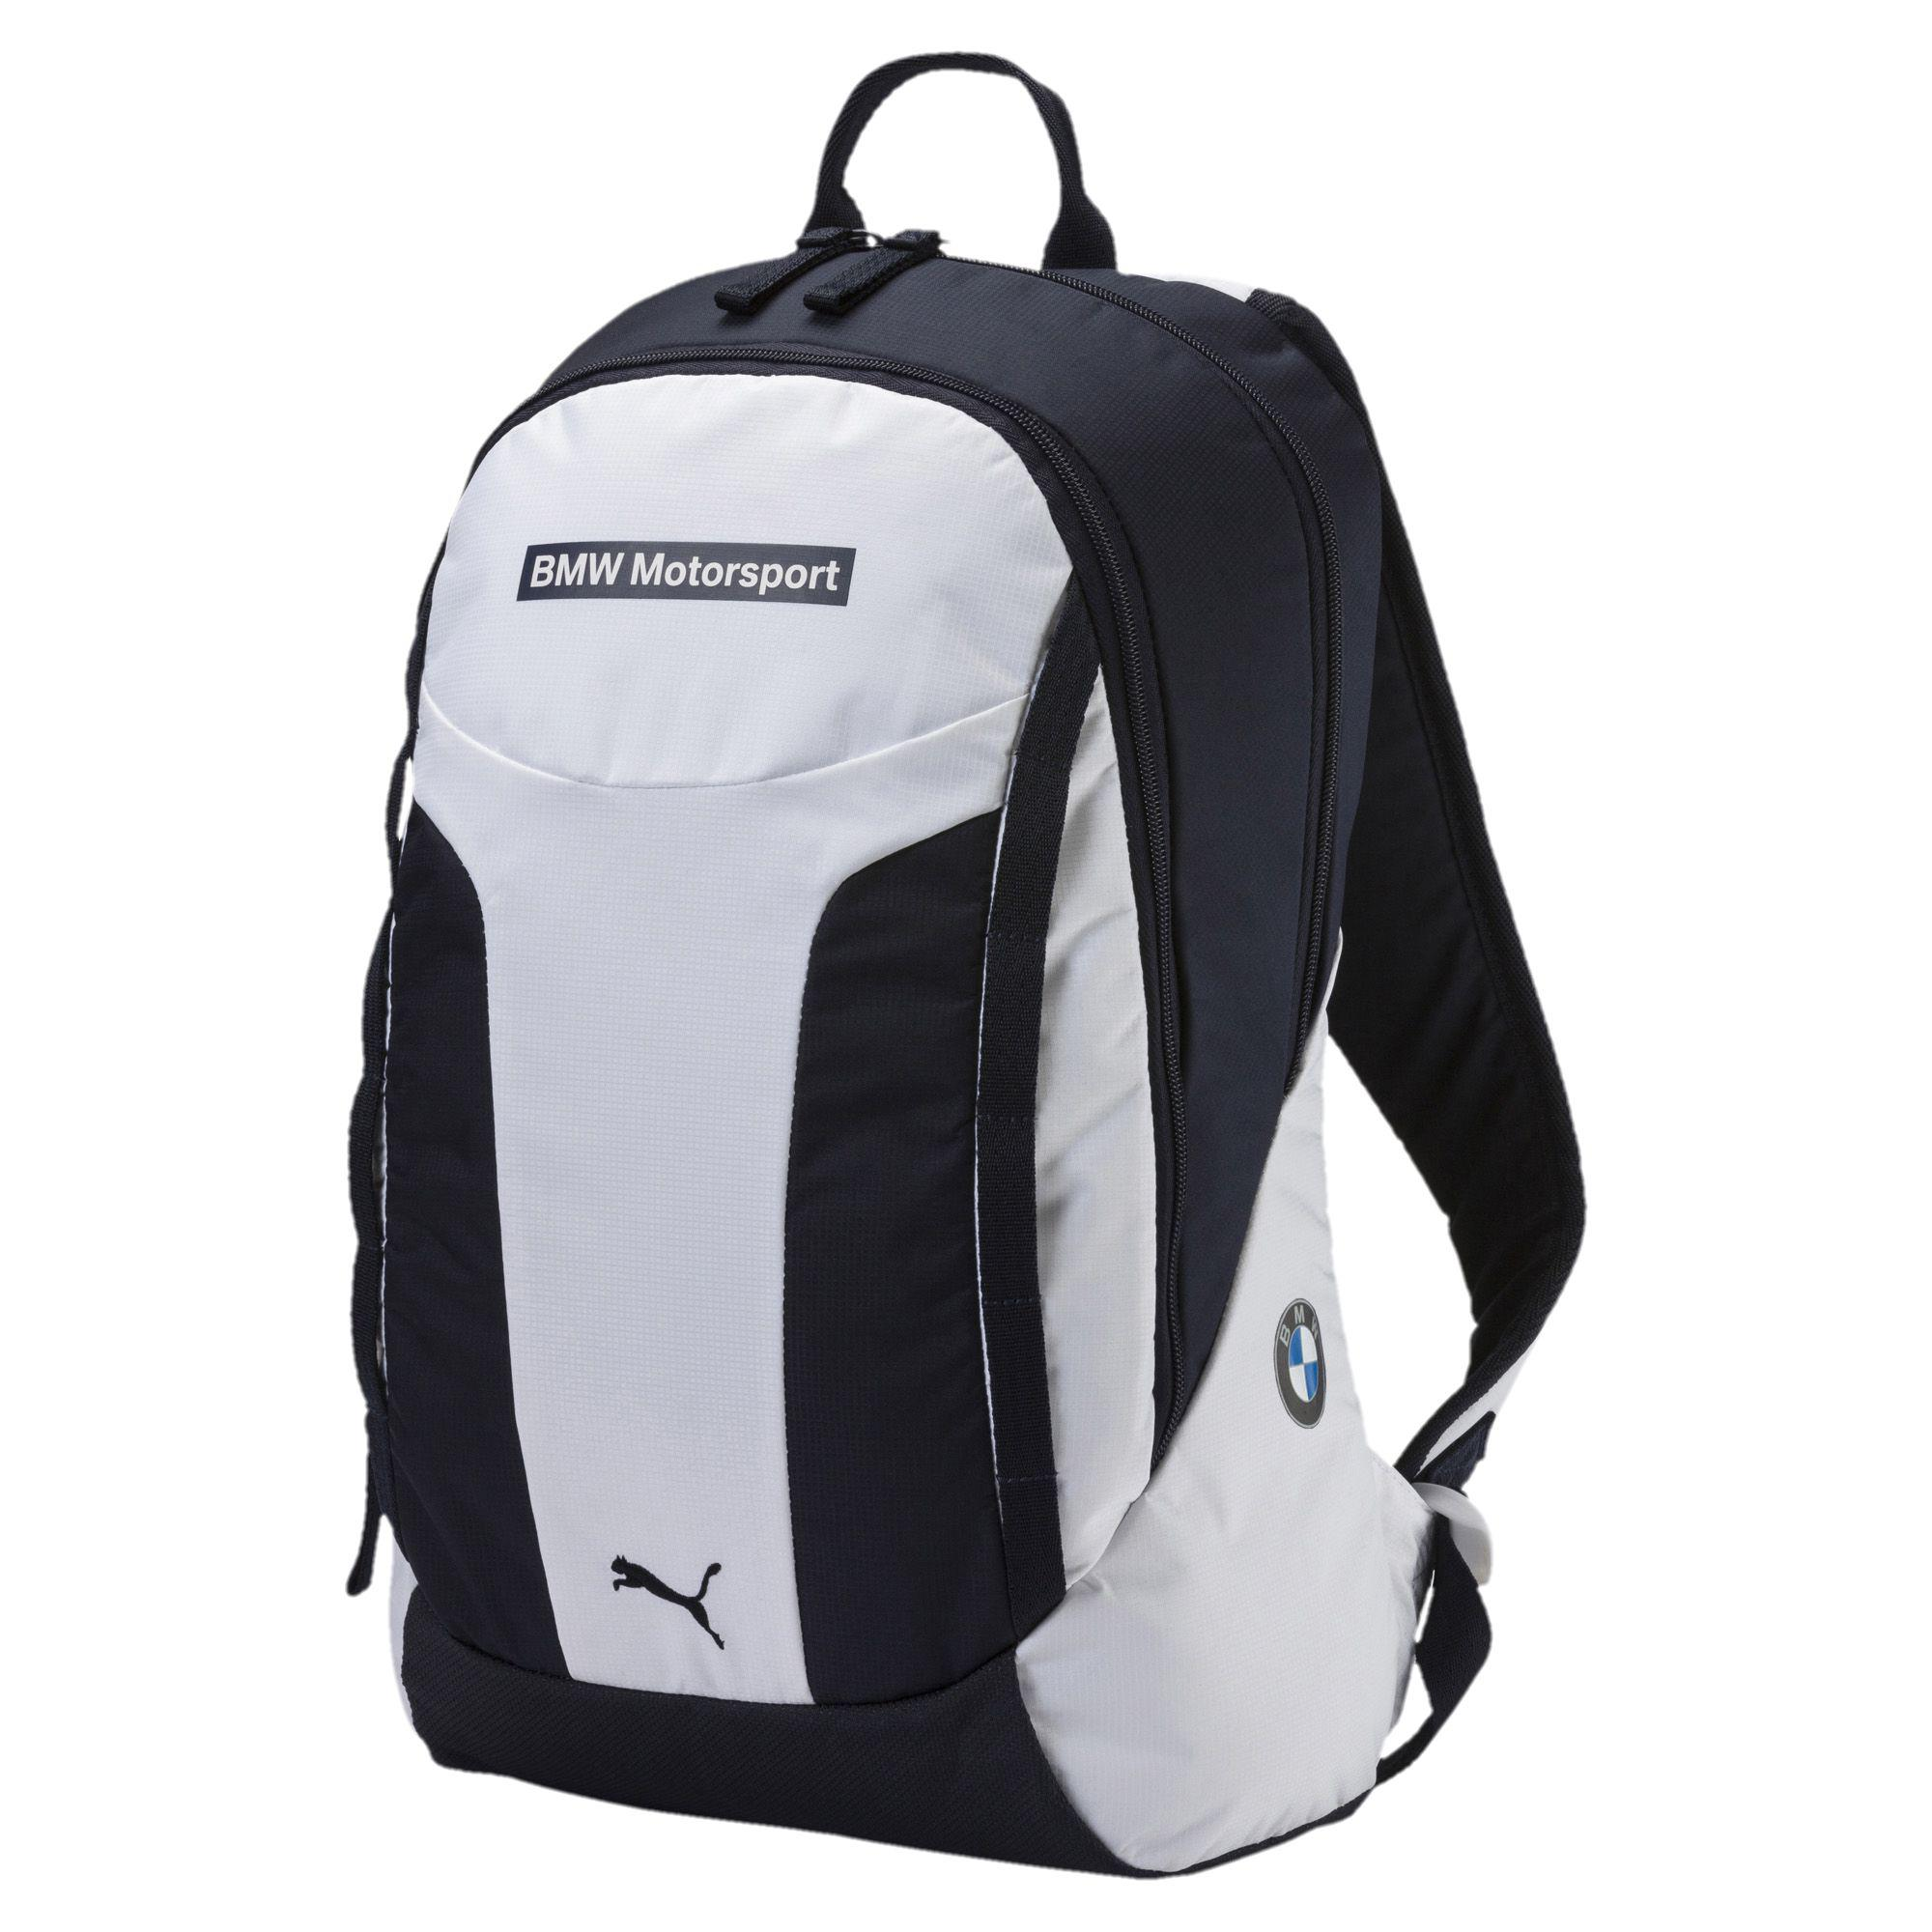 99a6f34636 Lyst - PUMA Bmw Motorsport Backpack in Blue for Men